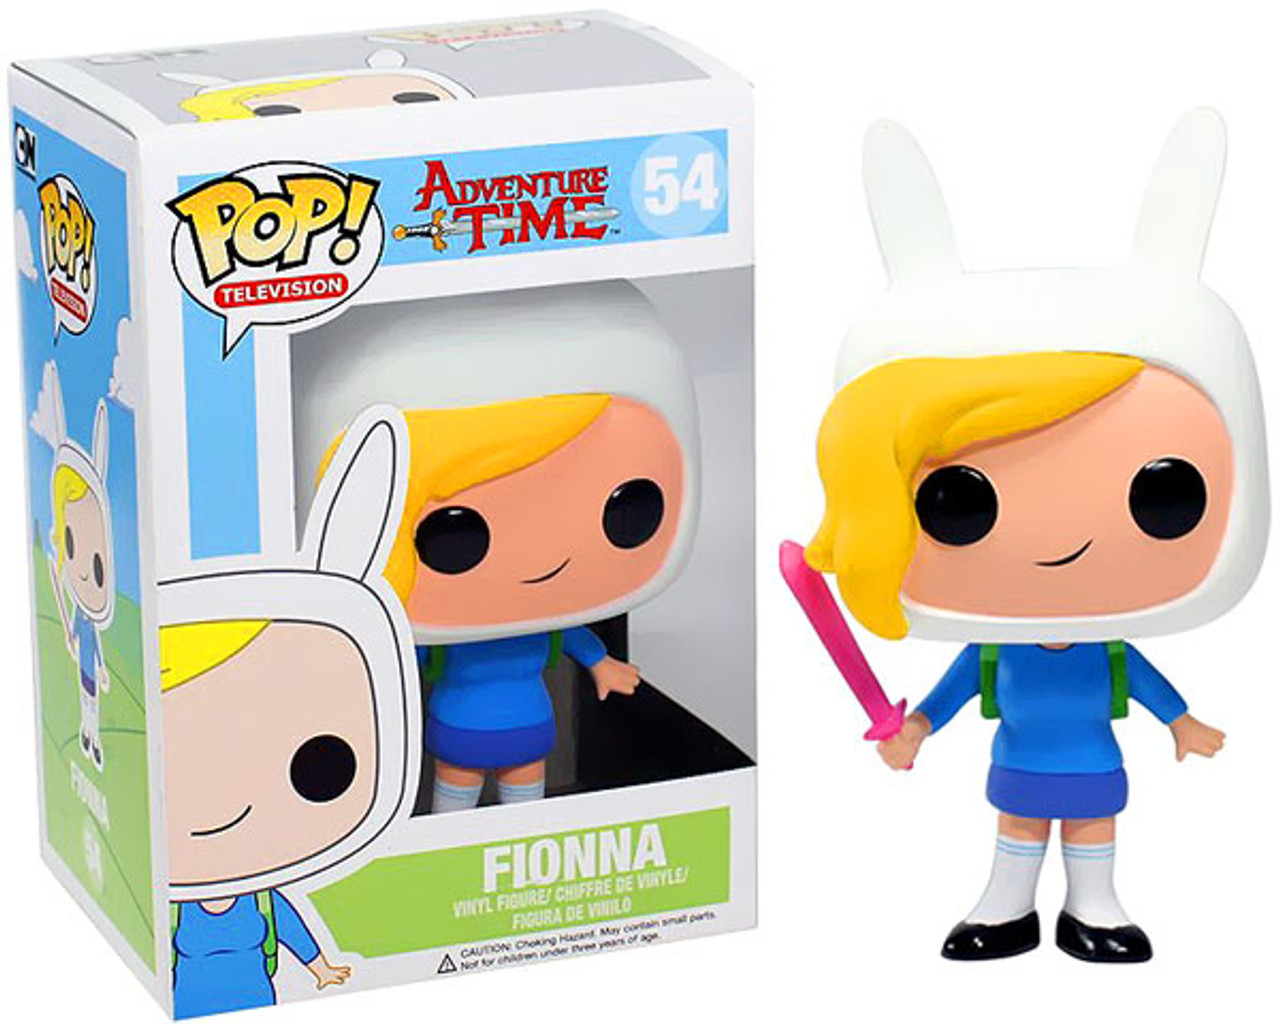 Adventure Time Funko POP! TV Fionna Vinyl Figure #54